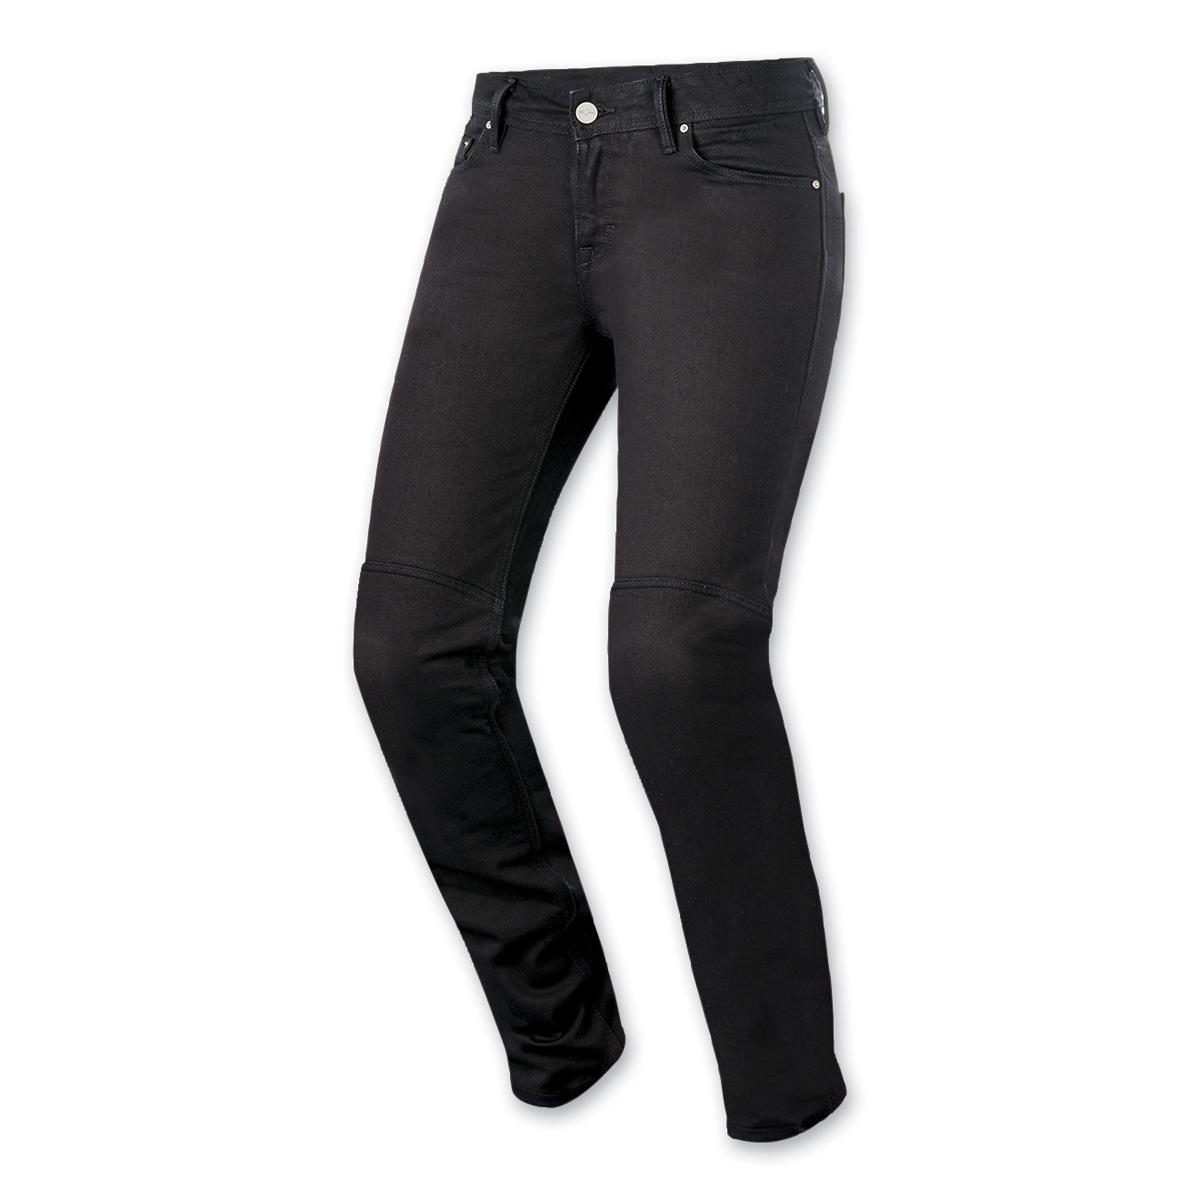 Alpinestars Women's Daisy Black Denim Jeans